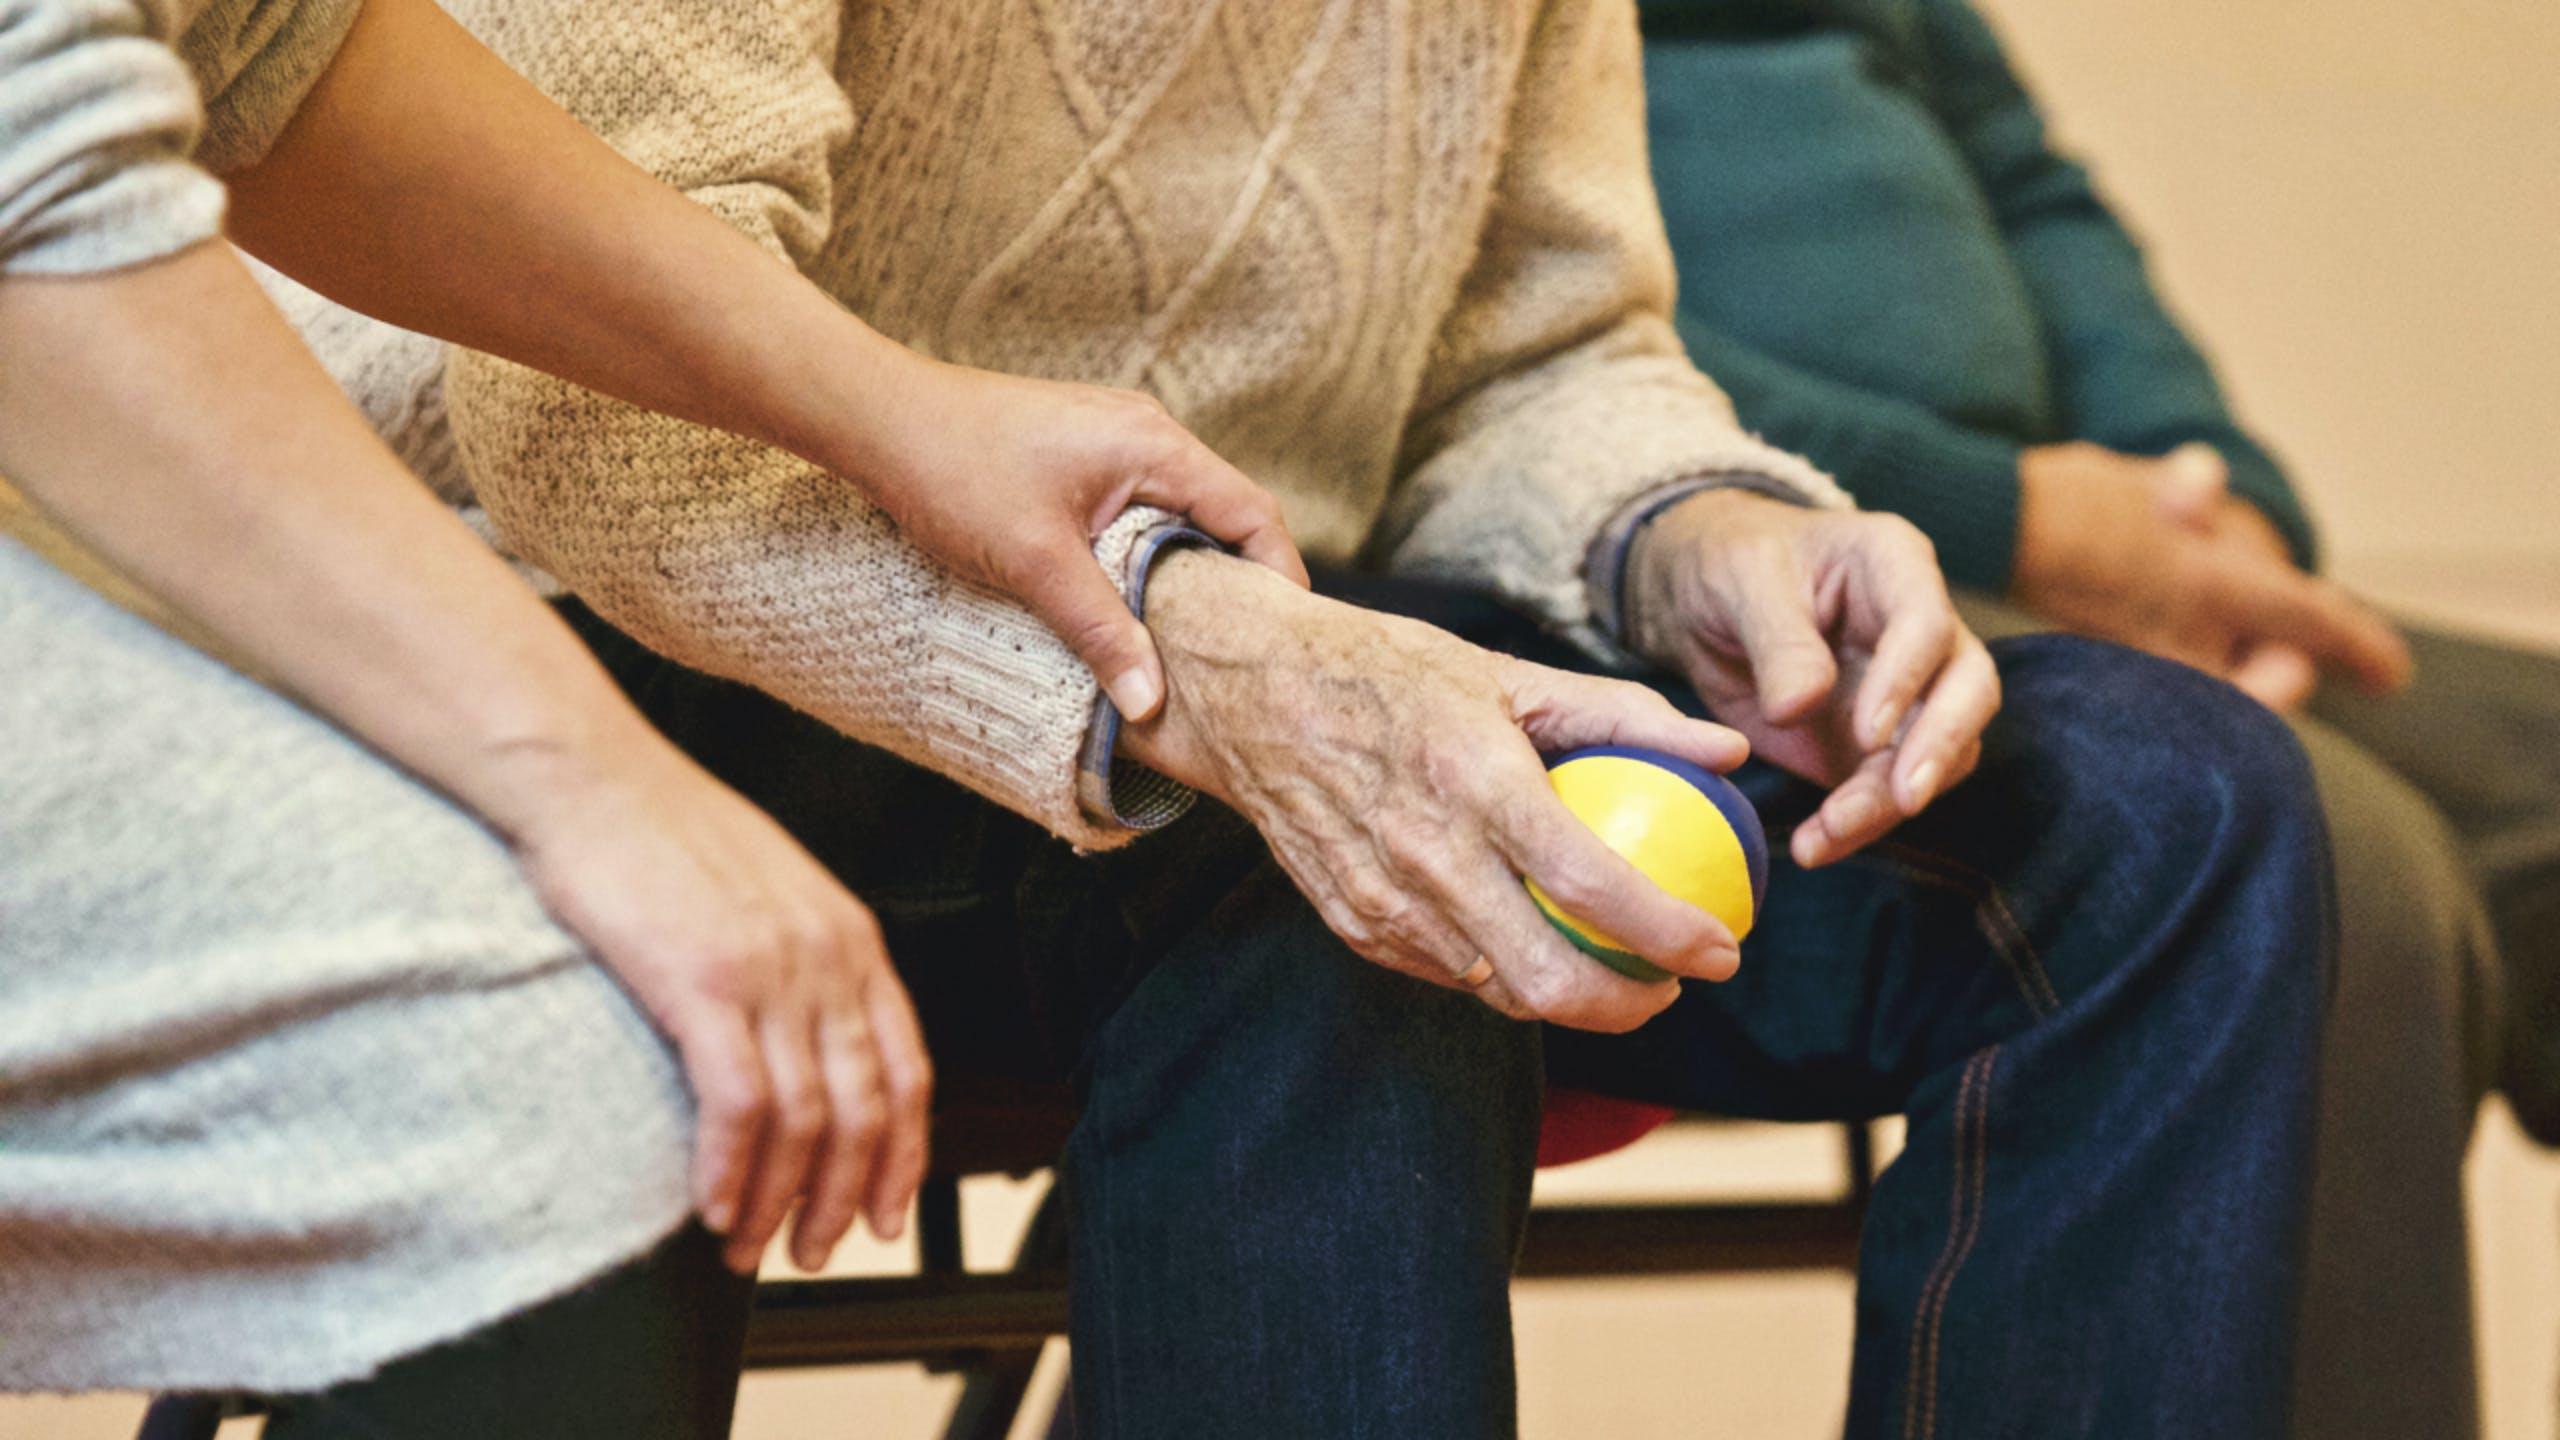 Elderly man gripping ball | PinnacleMensHealthJacksonville.com